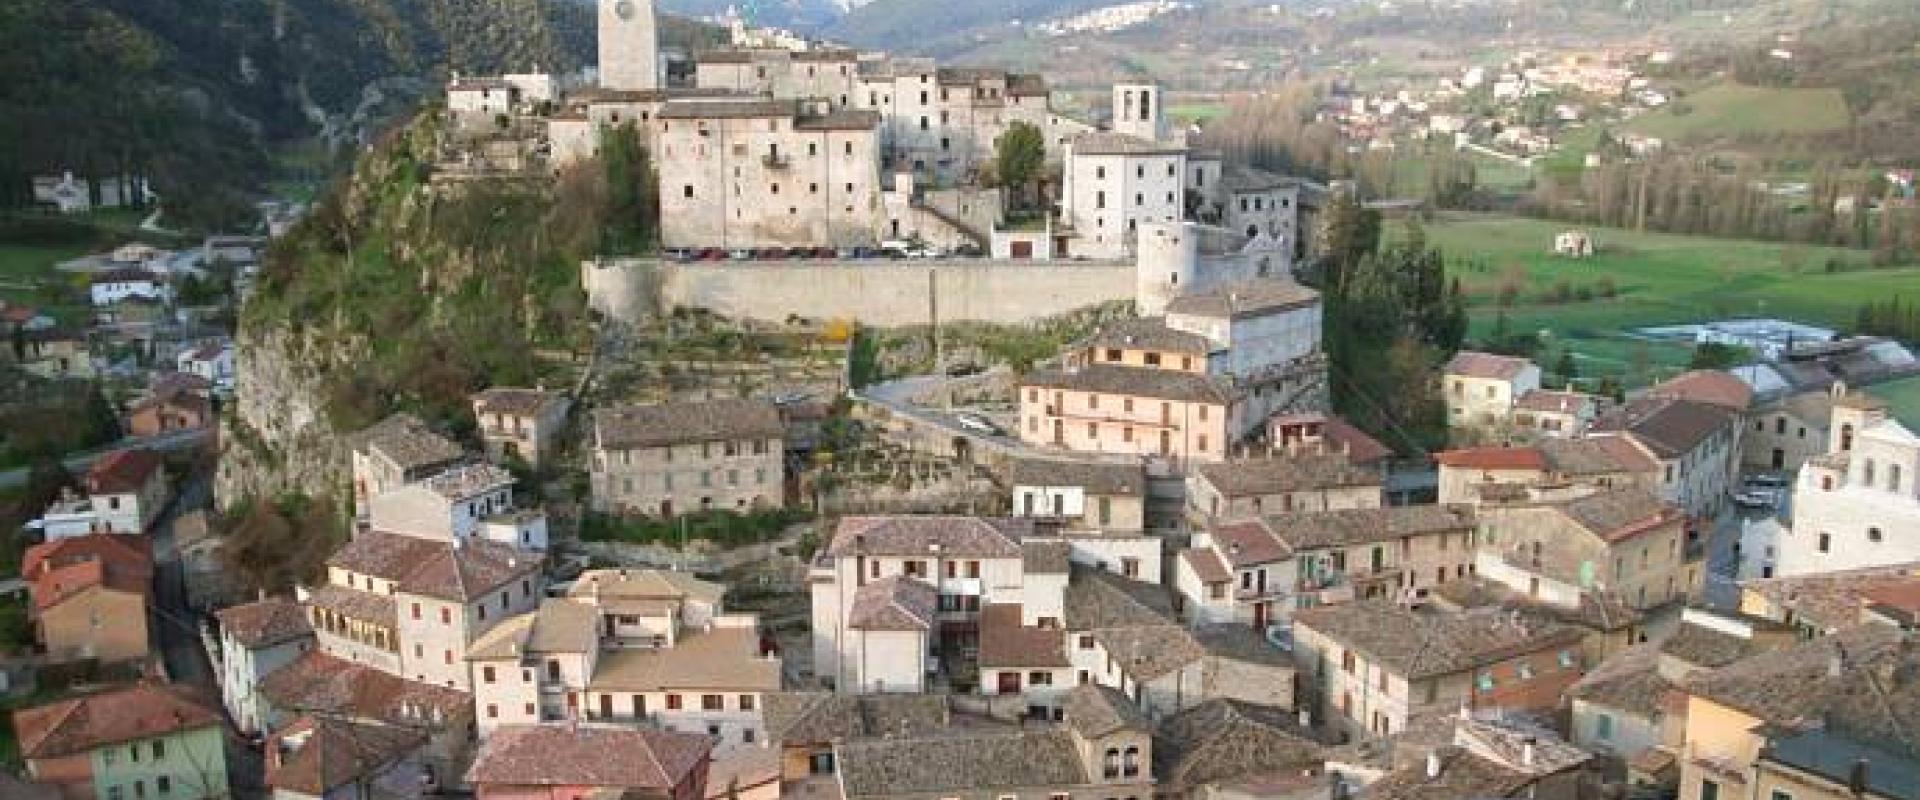 Viist of Arrone Umbria